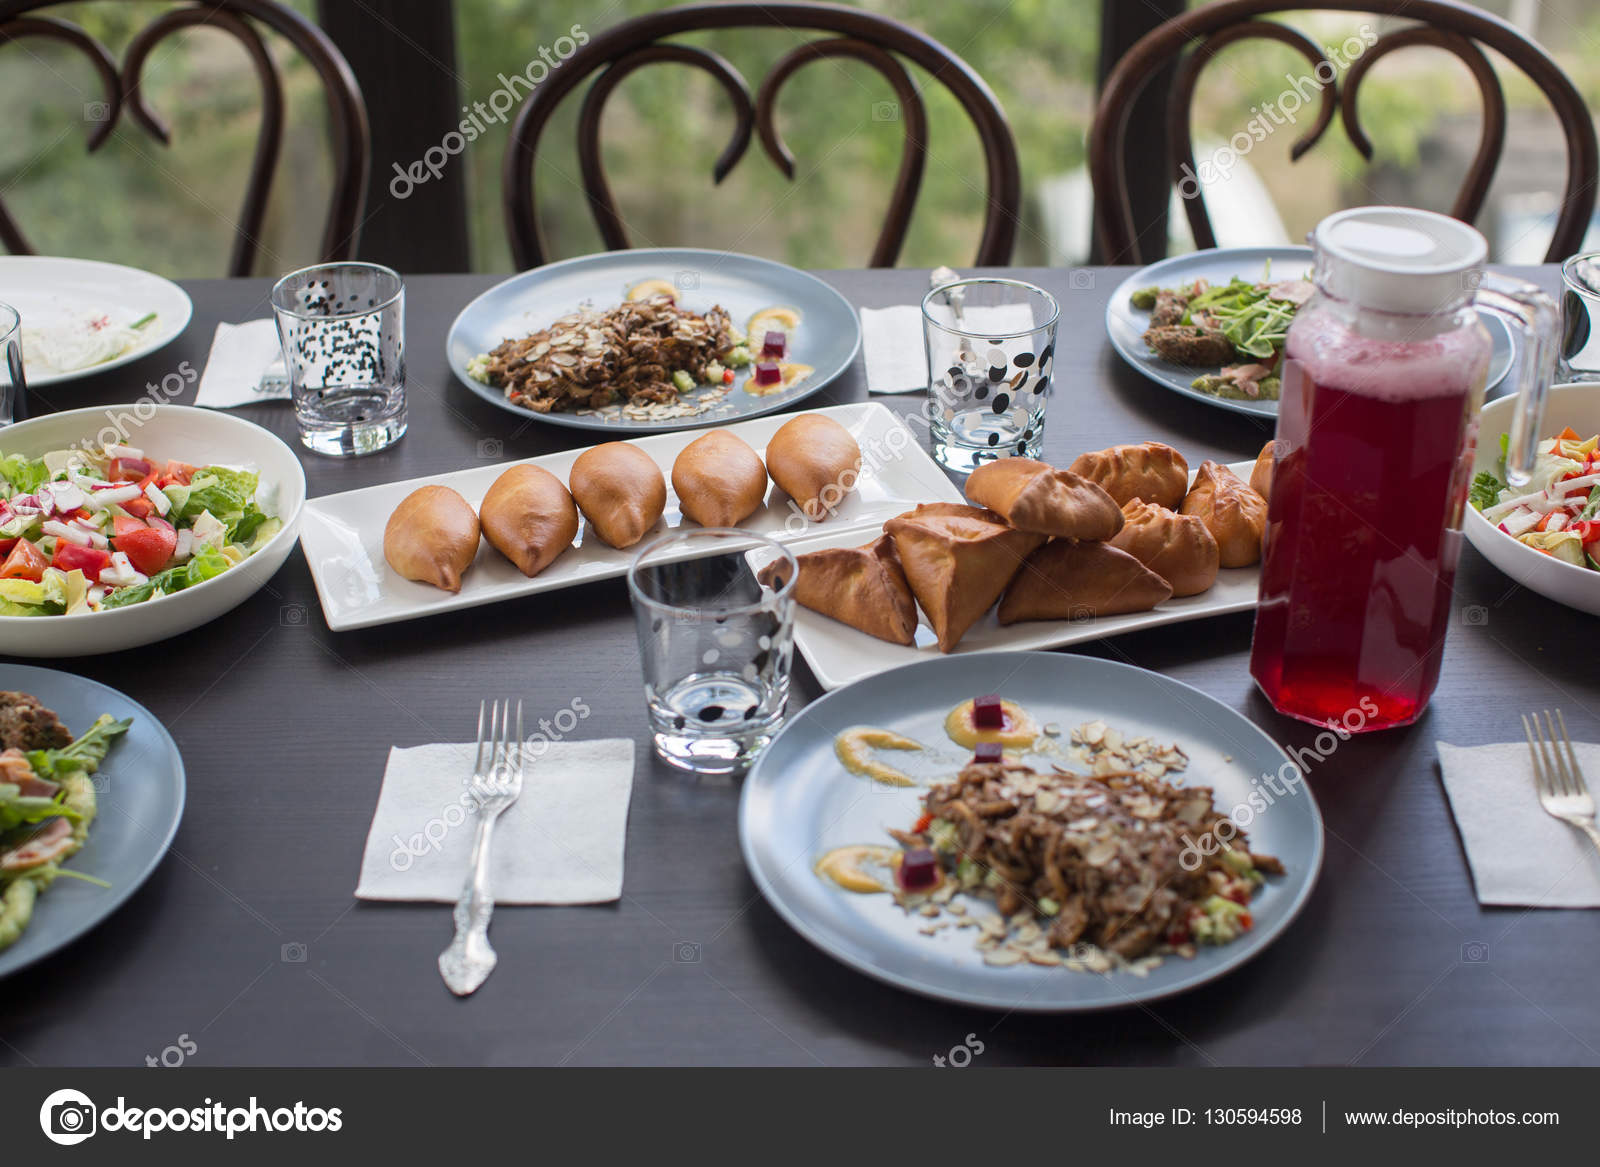 Foto Di Una Tavola Imbandita.Tavola Imbandita Per Una Cena In Famiglia Foto Stock